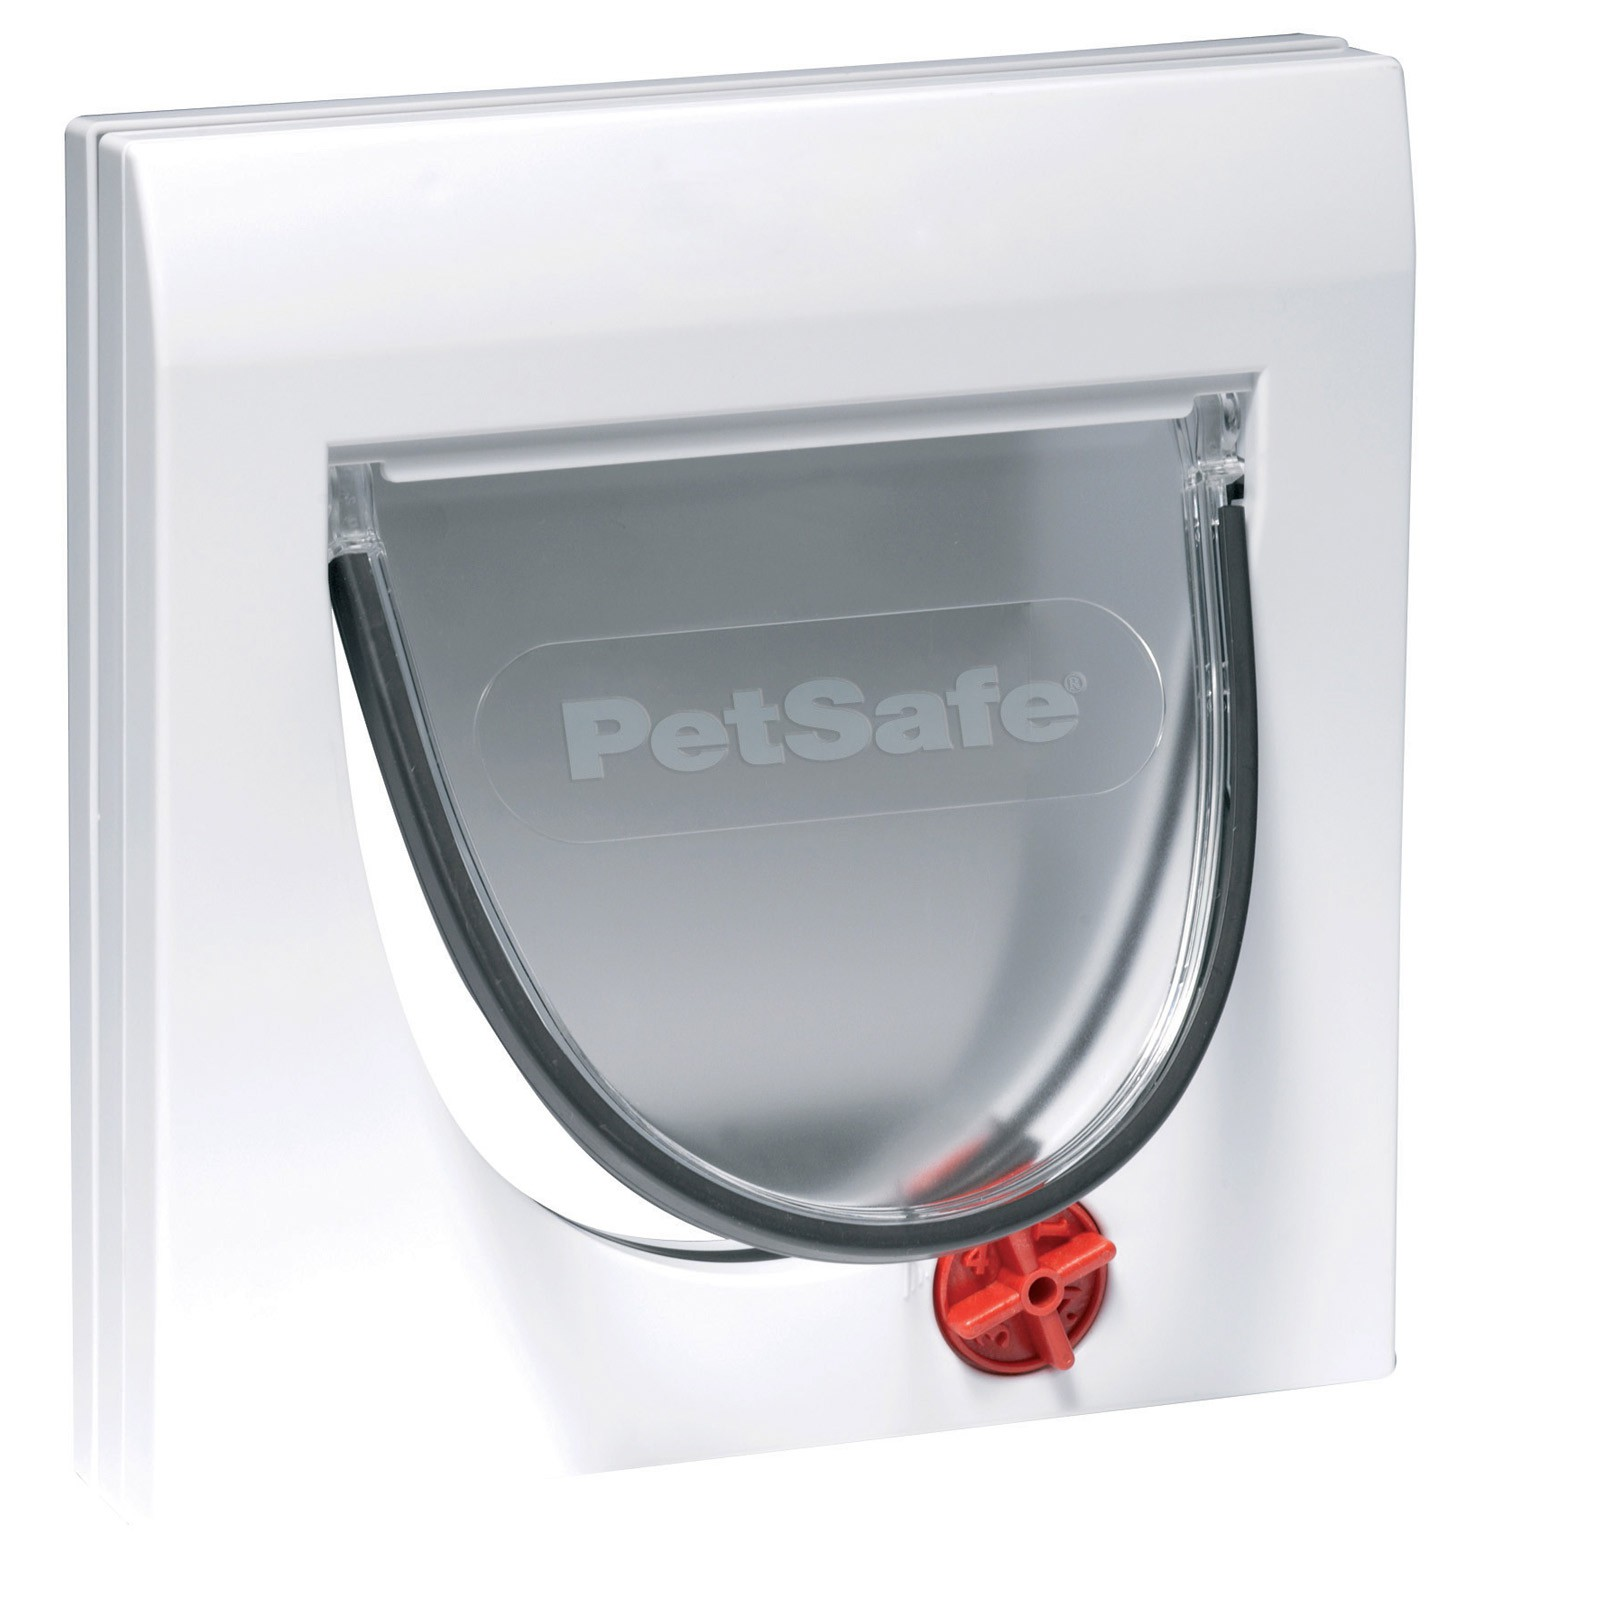 PetSafe Staywell Katzenklappe / Katzentür Katzen Tür K917SGIFD